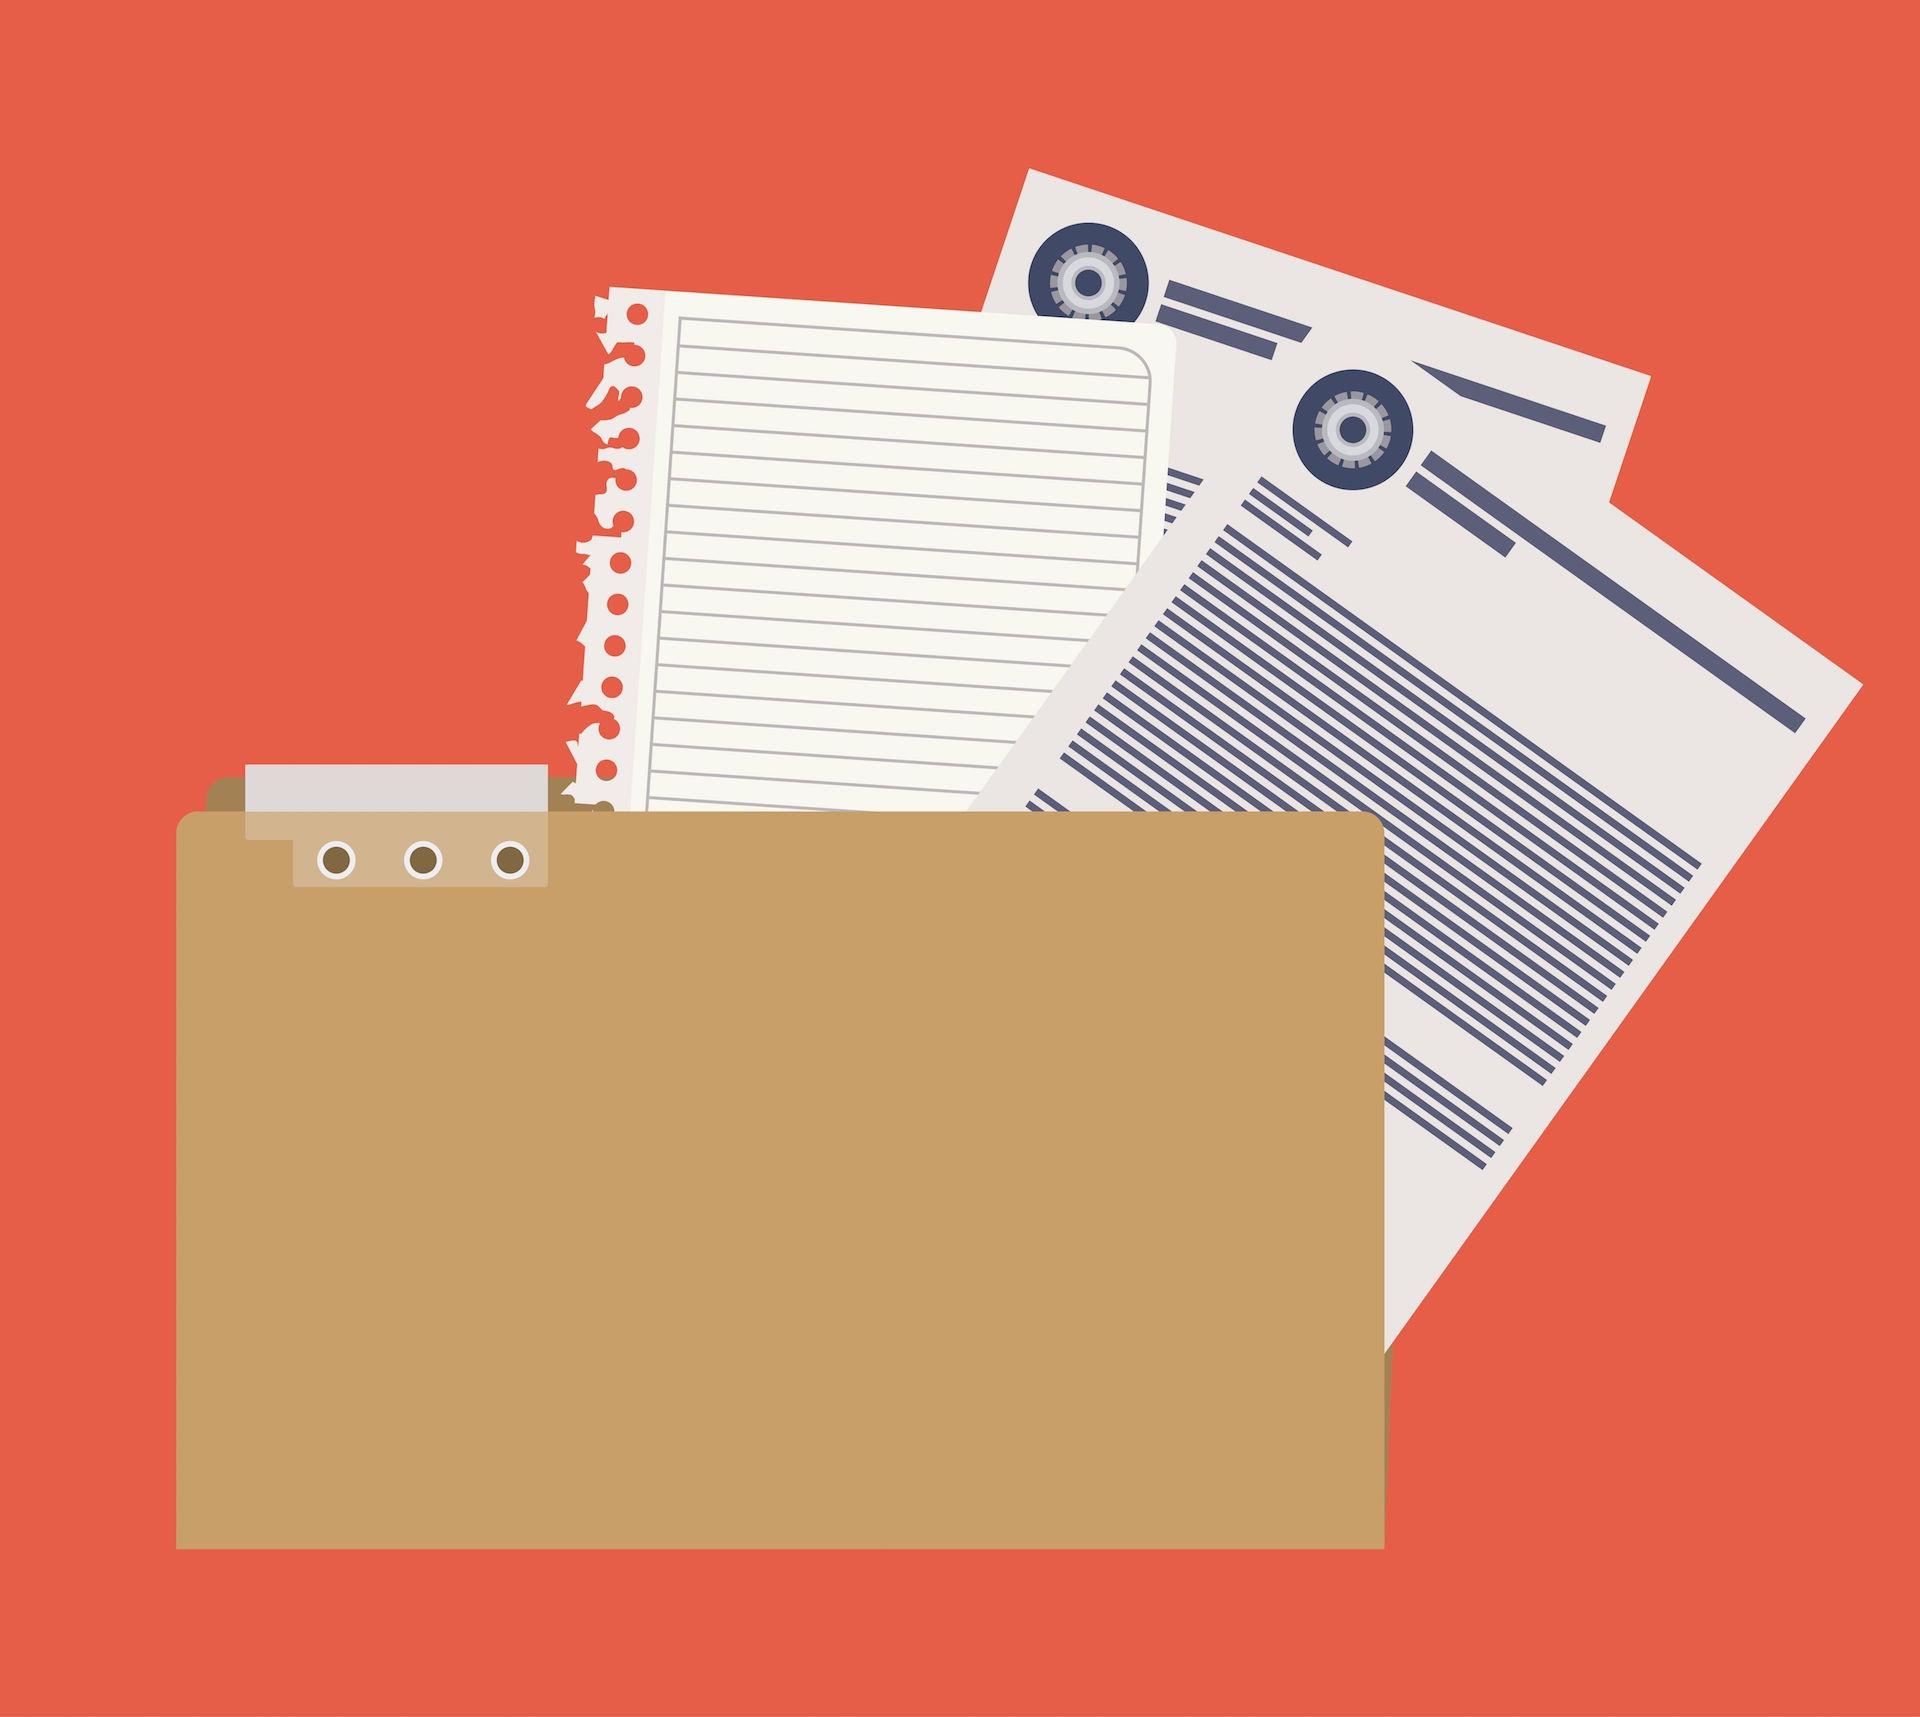 tips-for-building-an-online-work-portfolio.jpg